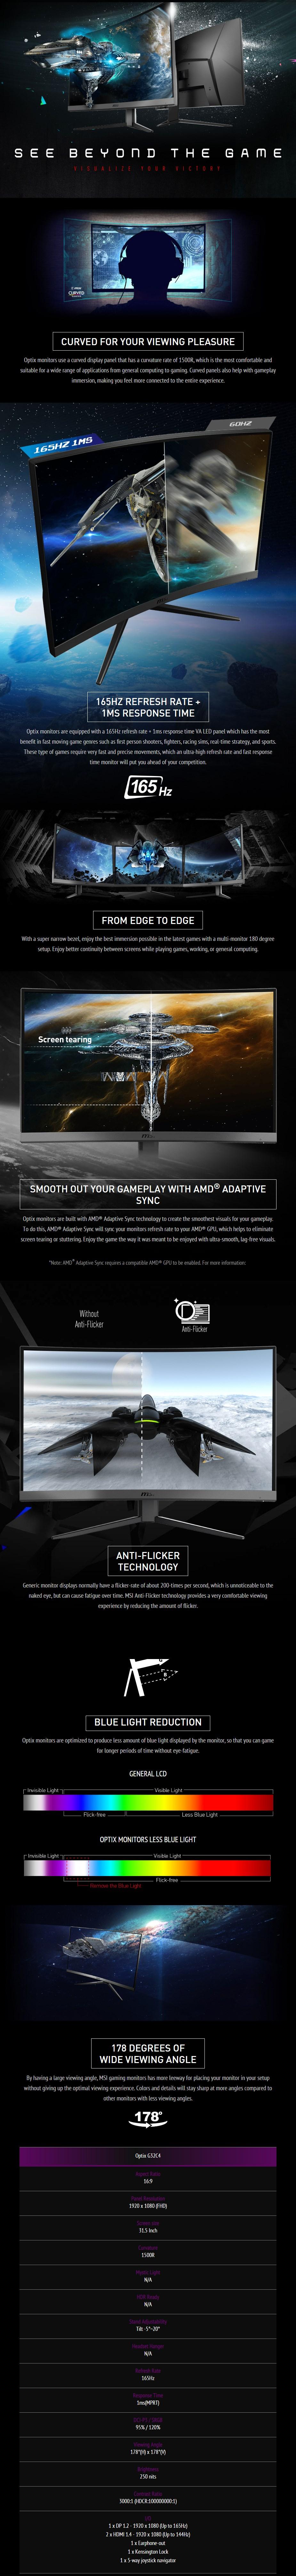 msi-optix-g32c4-315-165hz-fhd-1ms-freesync-curved-va-gaming-monitor-ac33397-6.jpg